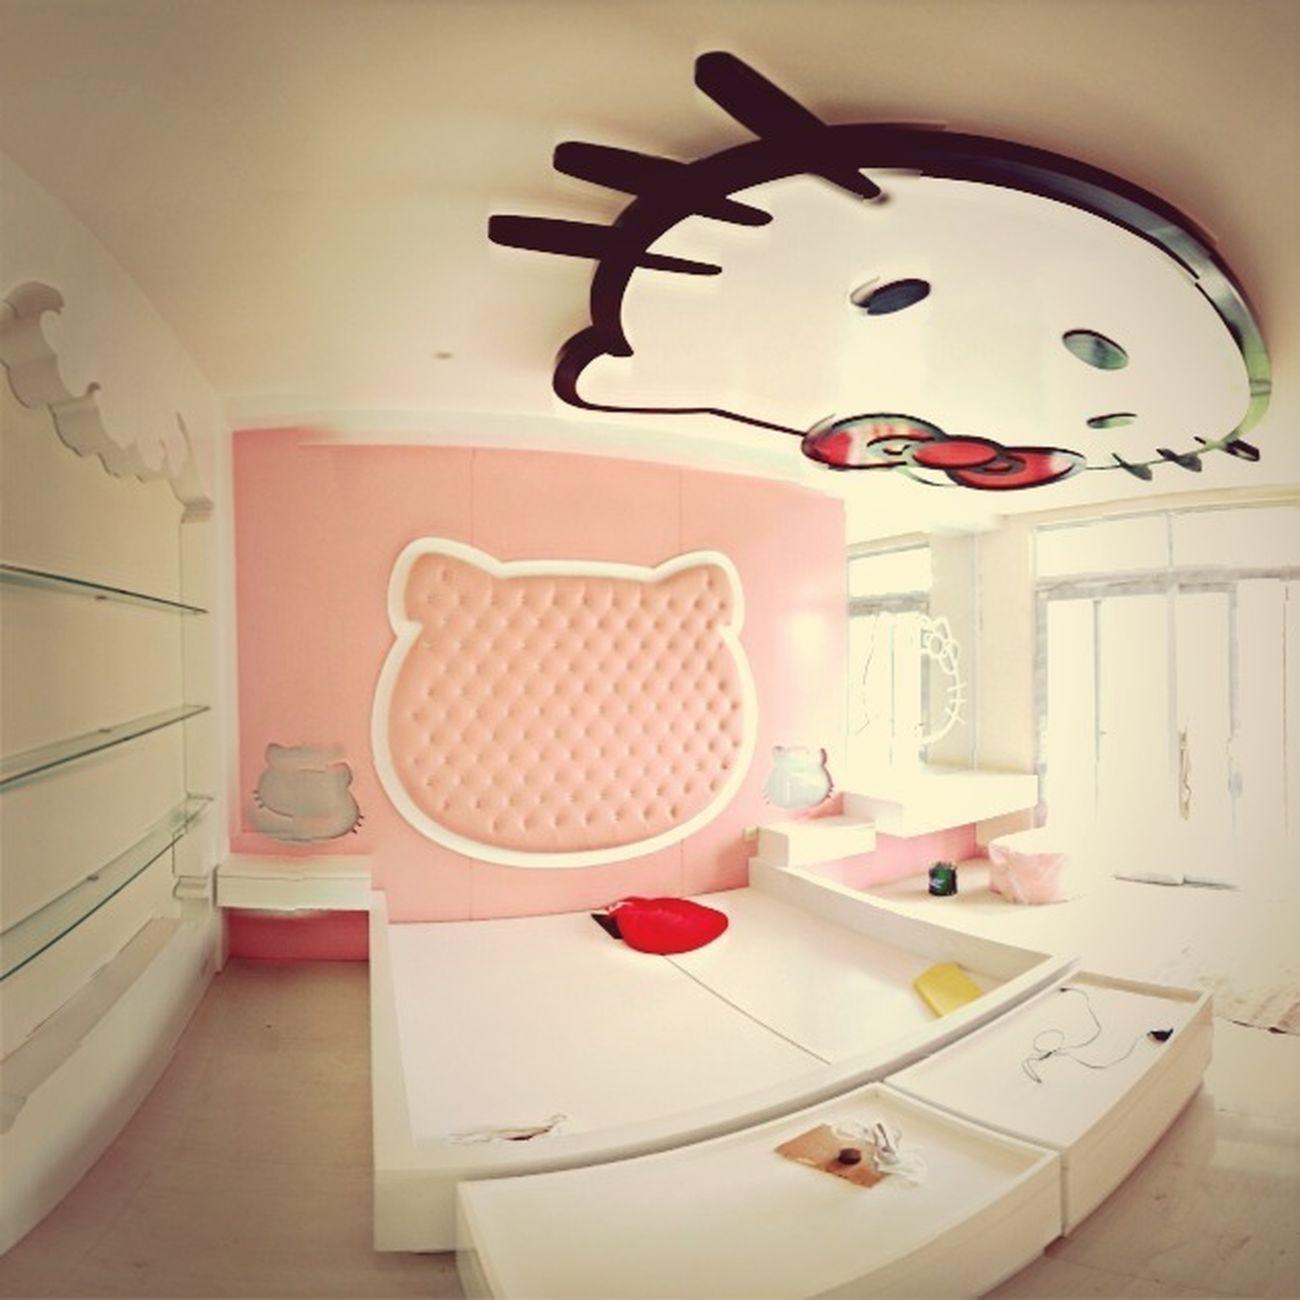 Room Hello_Kitty jInterior Design Jheffryswid Design